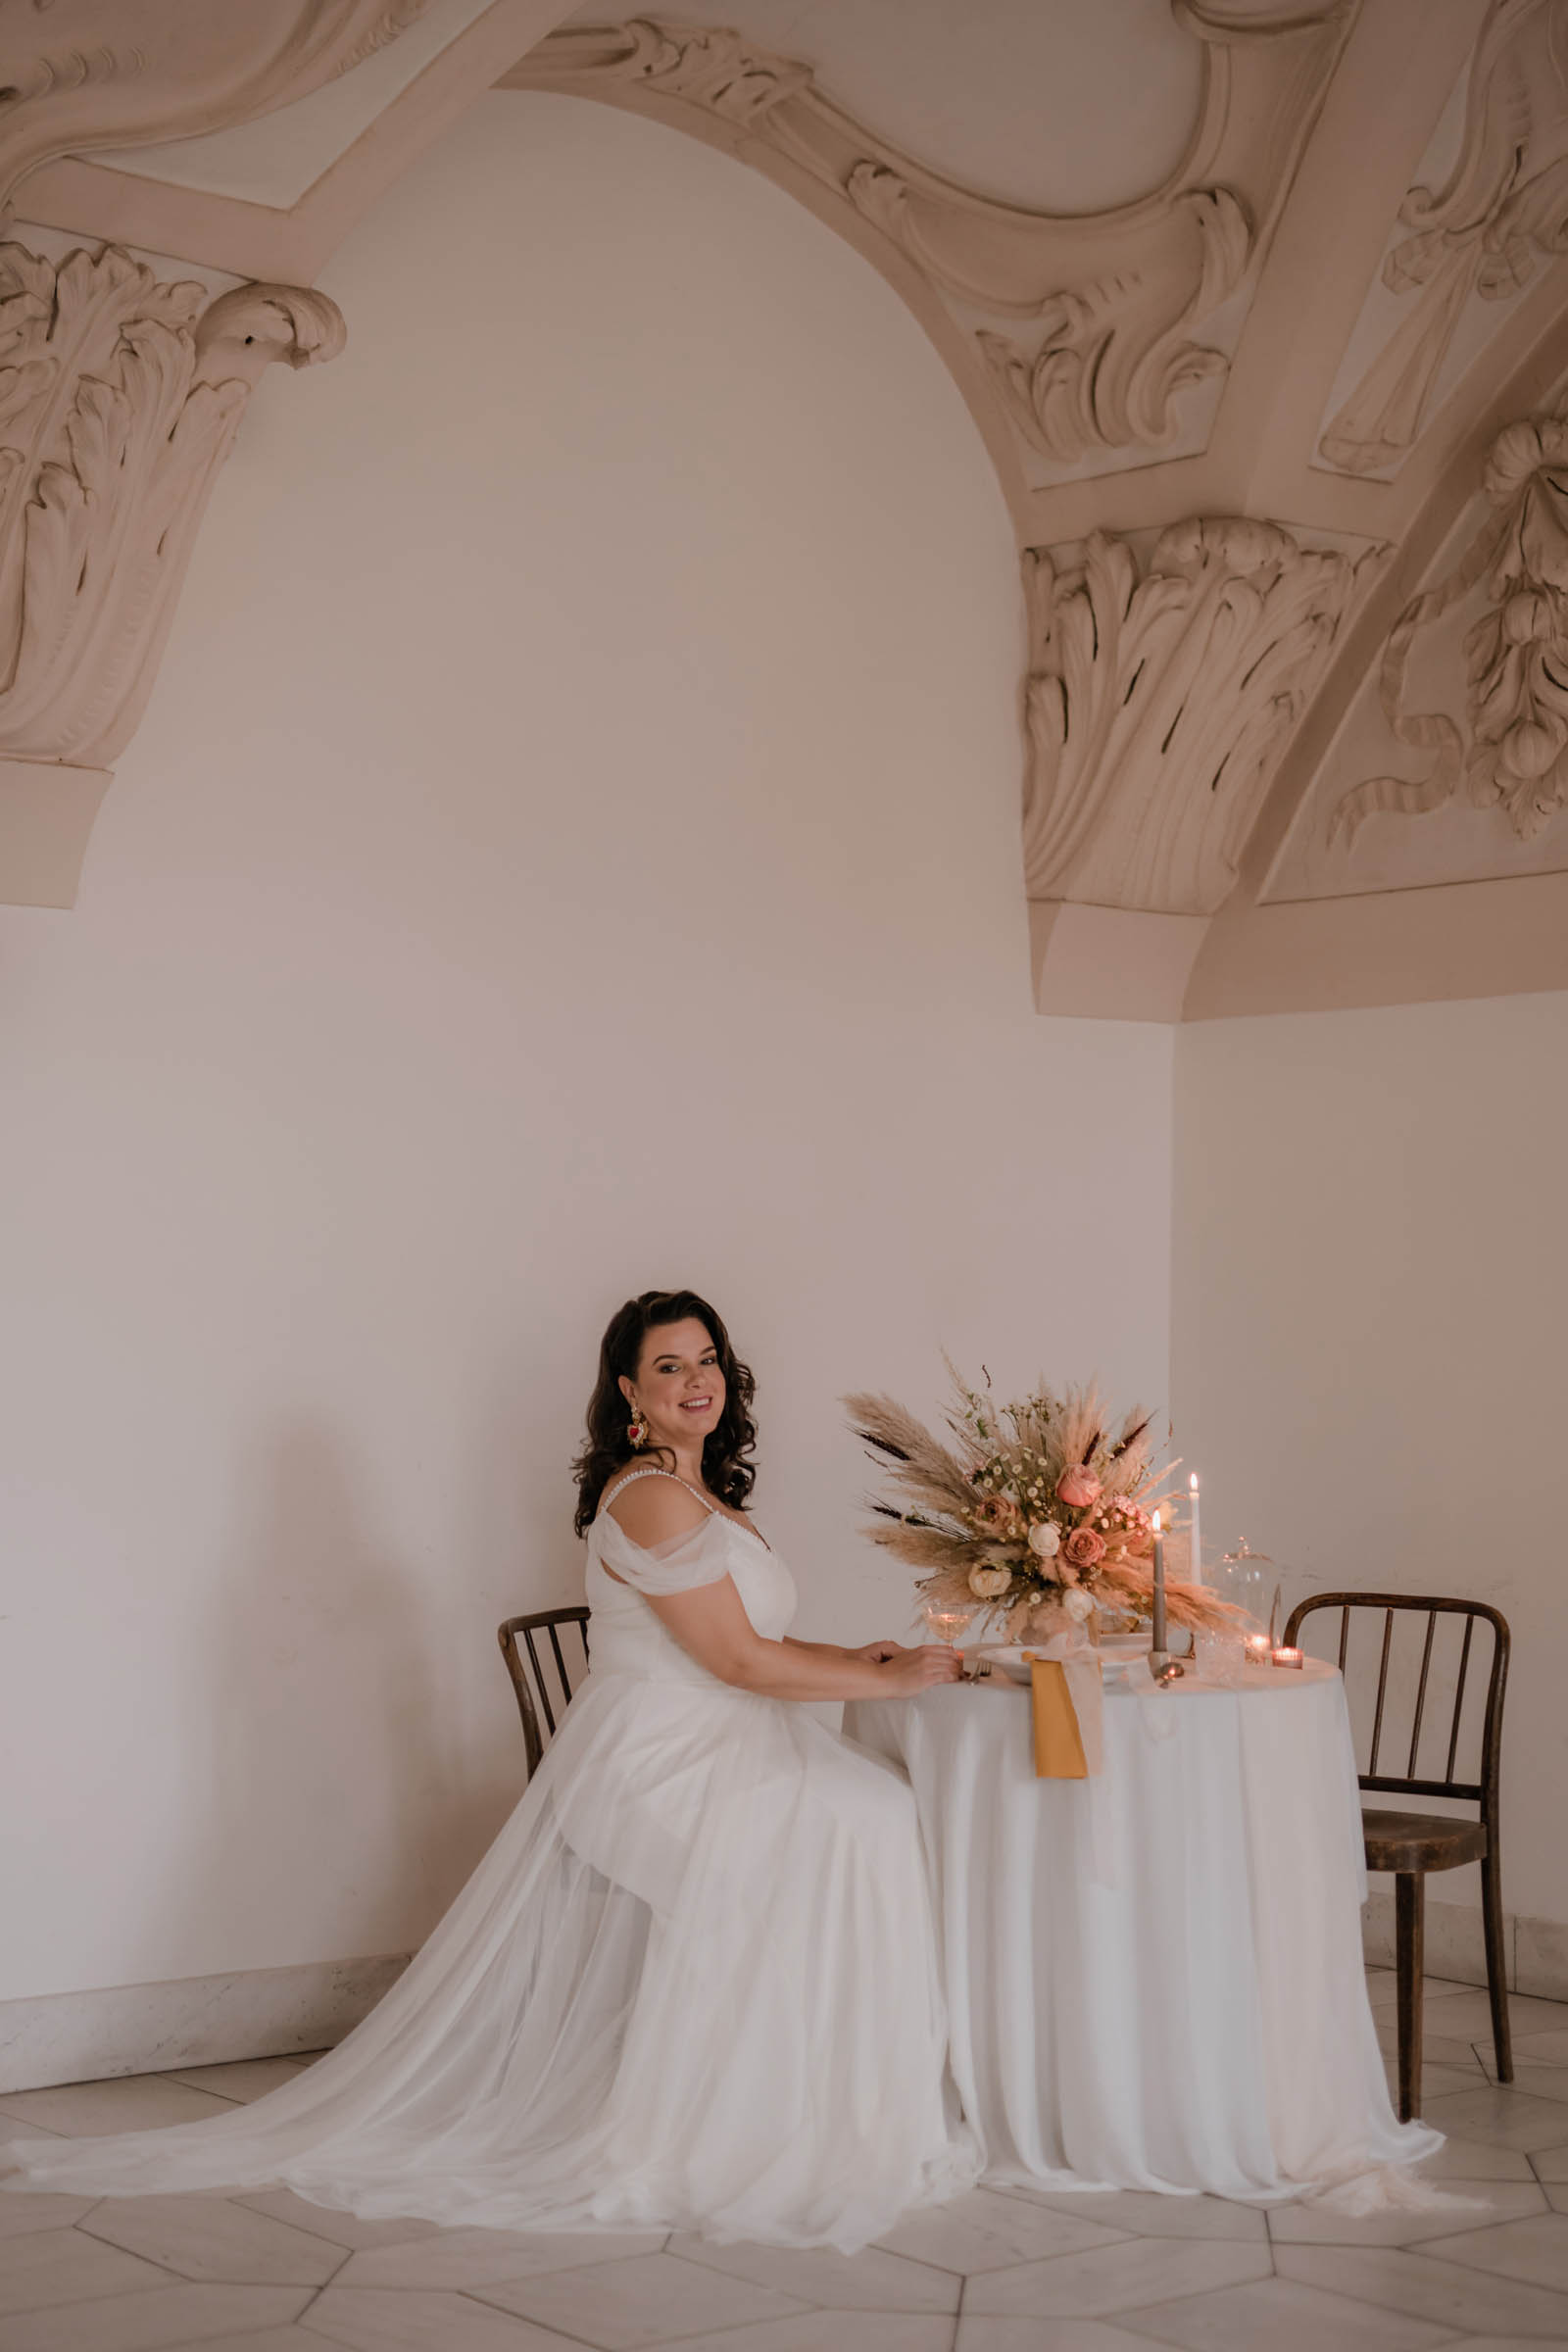 boho-svadobne-saty-veronika-kostkova-wedding-atelier-2019-tia-1